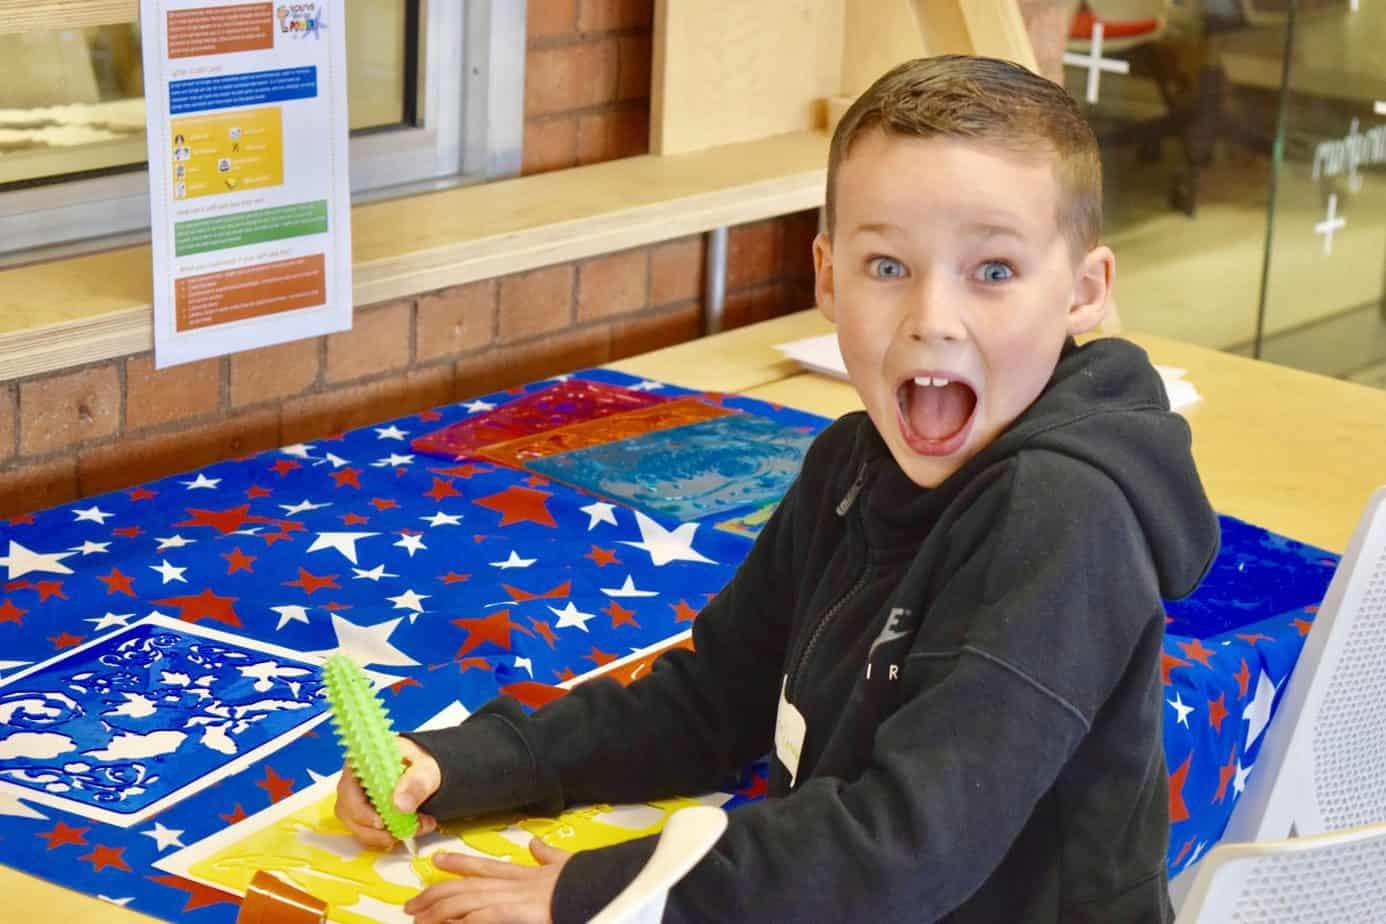 B enjoying some writing and colouring at Playfest at Impact Hub birmingham